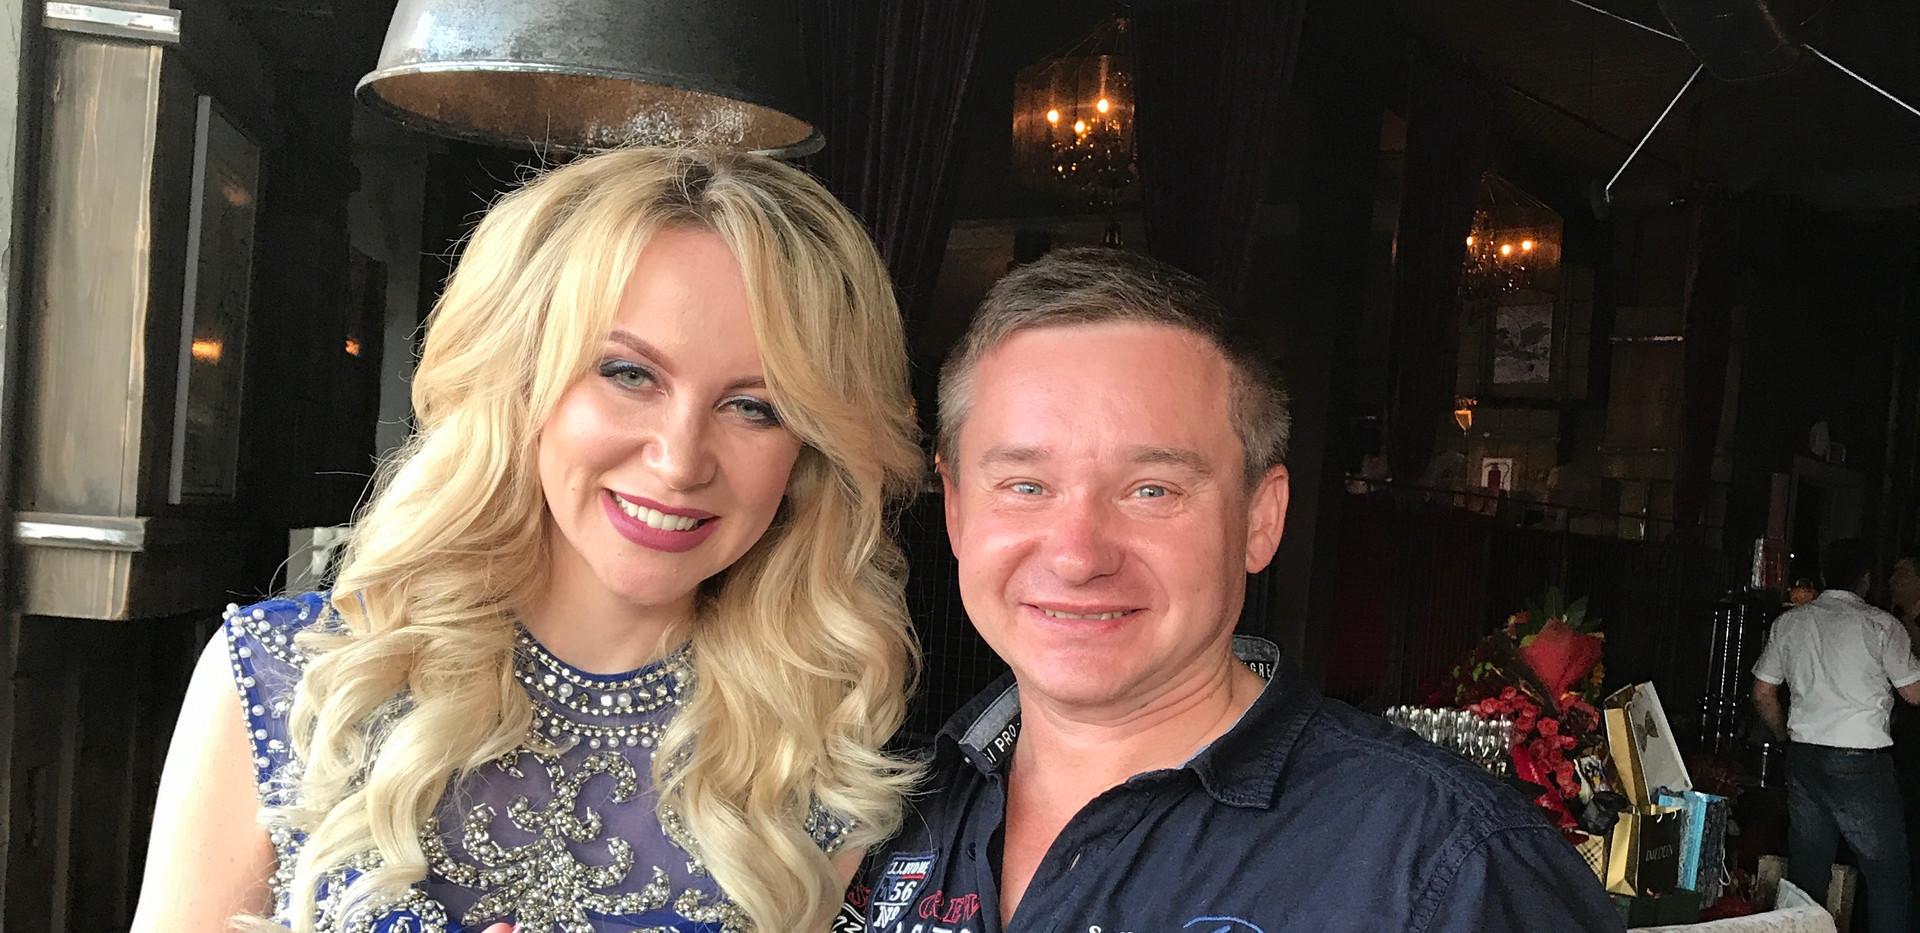 Produzent Roman Rossi und Moderatorin Maria Ost